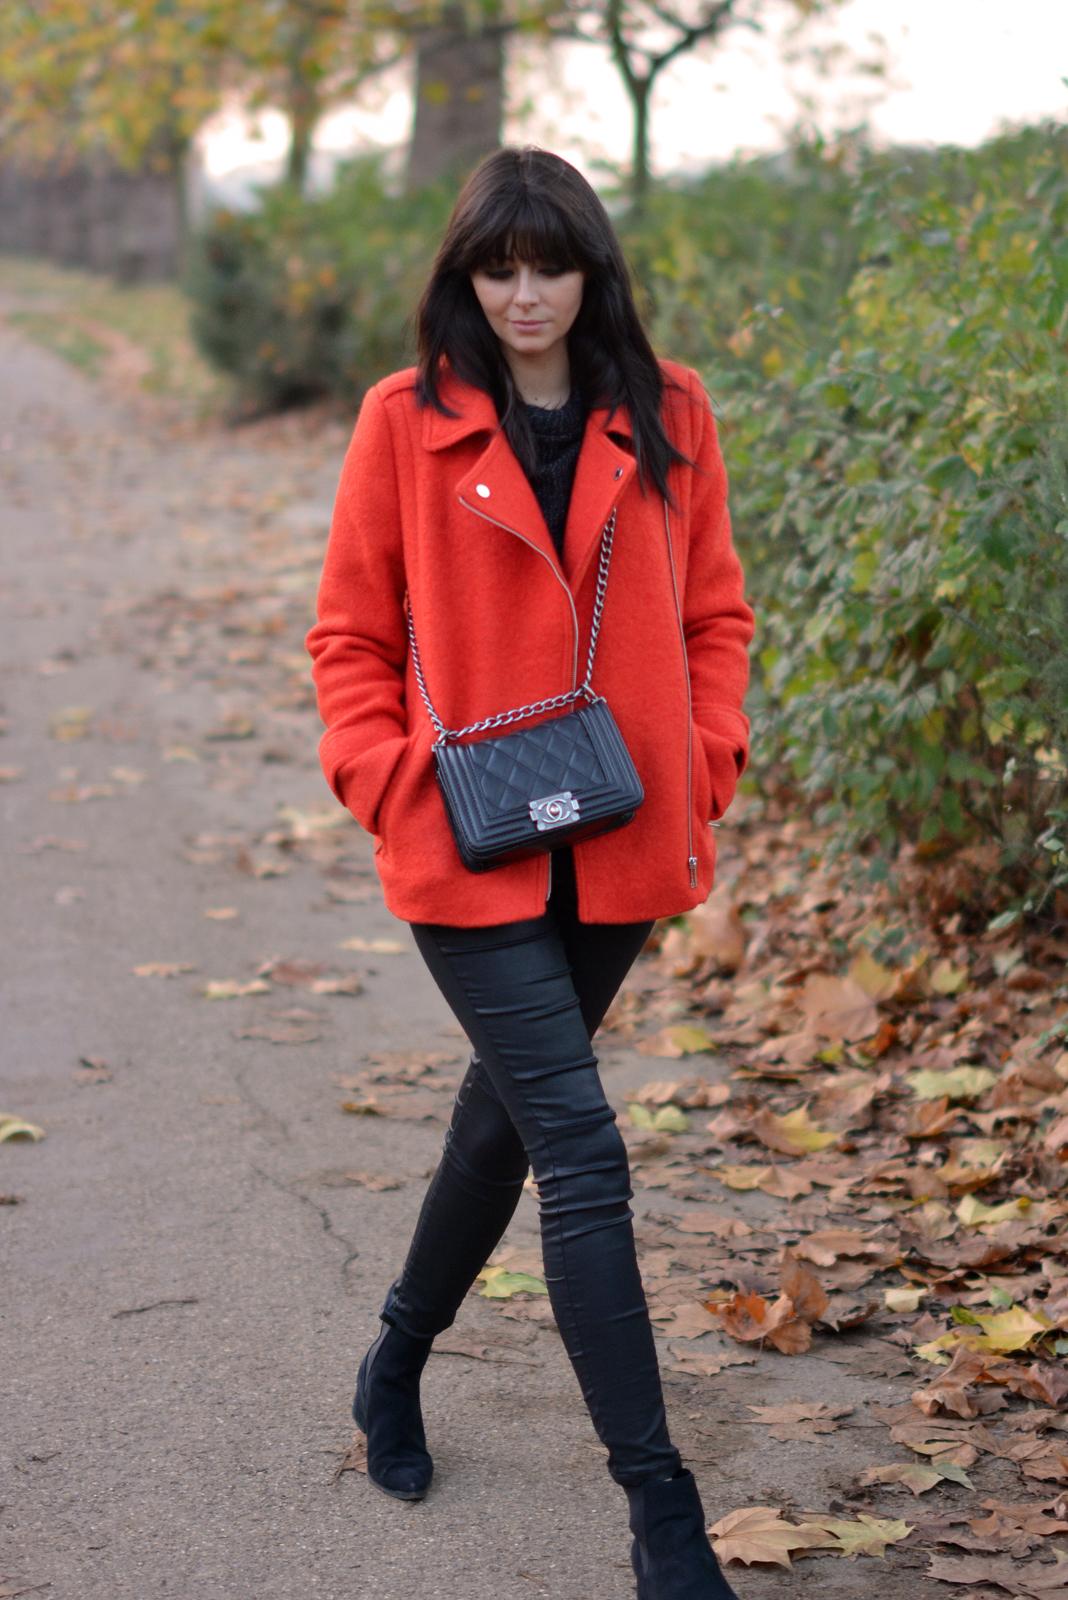 EJSTYLE - Debenhams EDITION Preen Orange Boucle biker jacket, Chanel Boy Bag Black, Fashion Blogger, street style